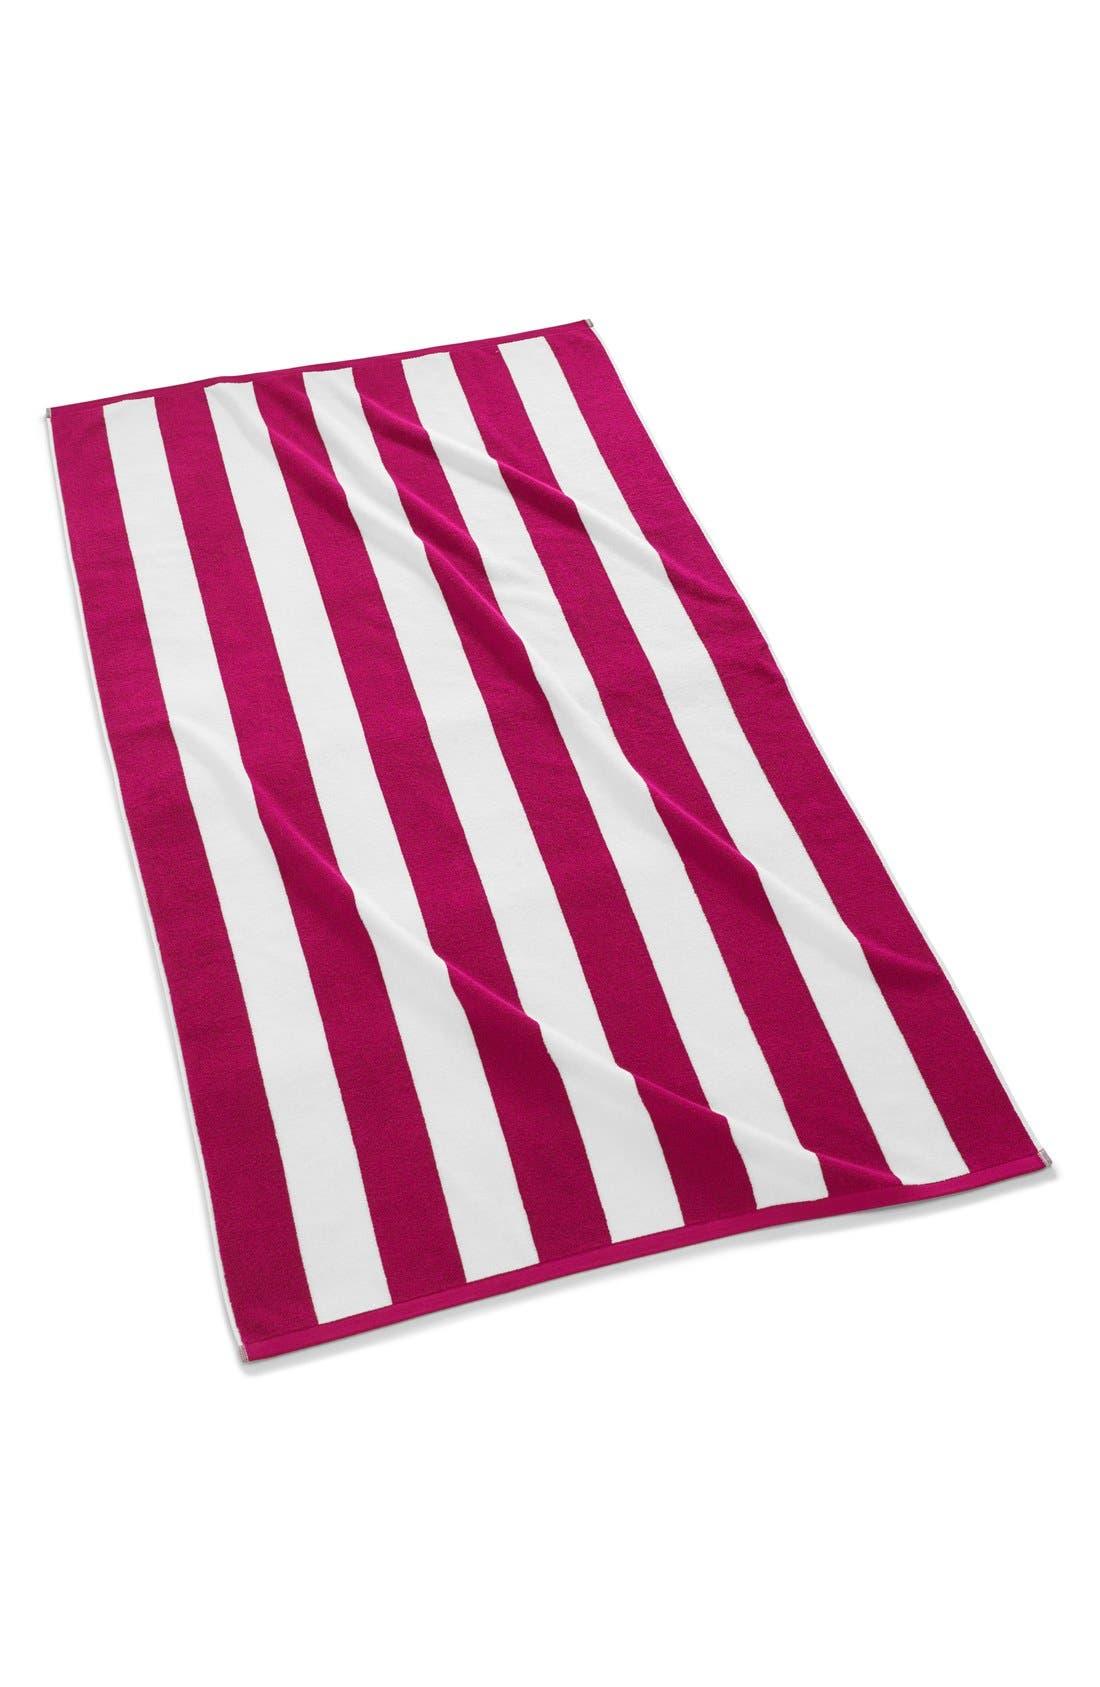 Main Image - KASSATEX 'Cabana' Stripe Beach Towel